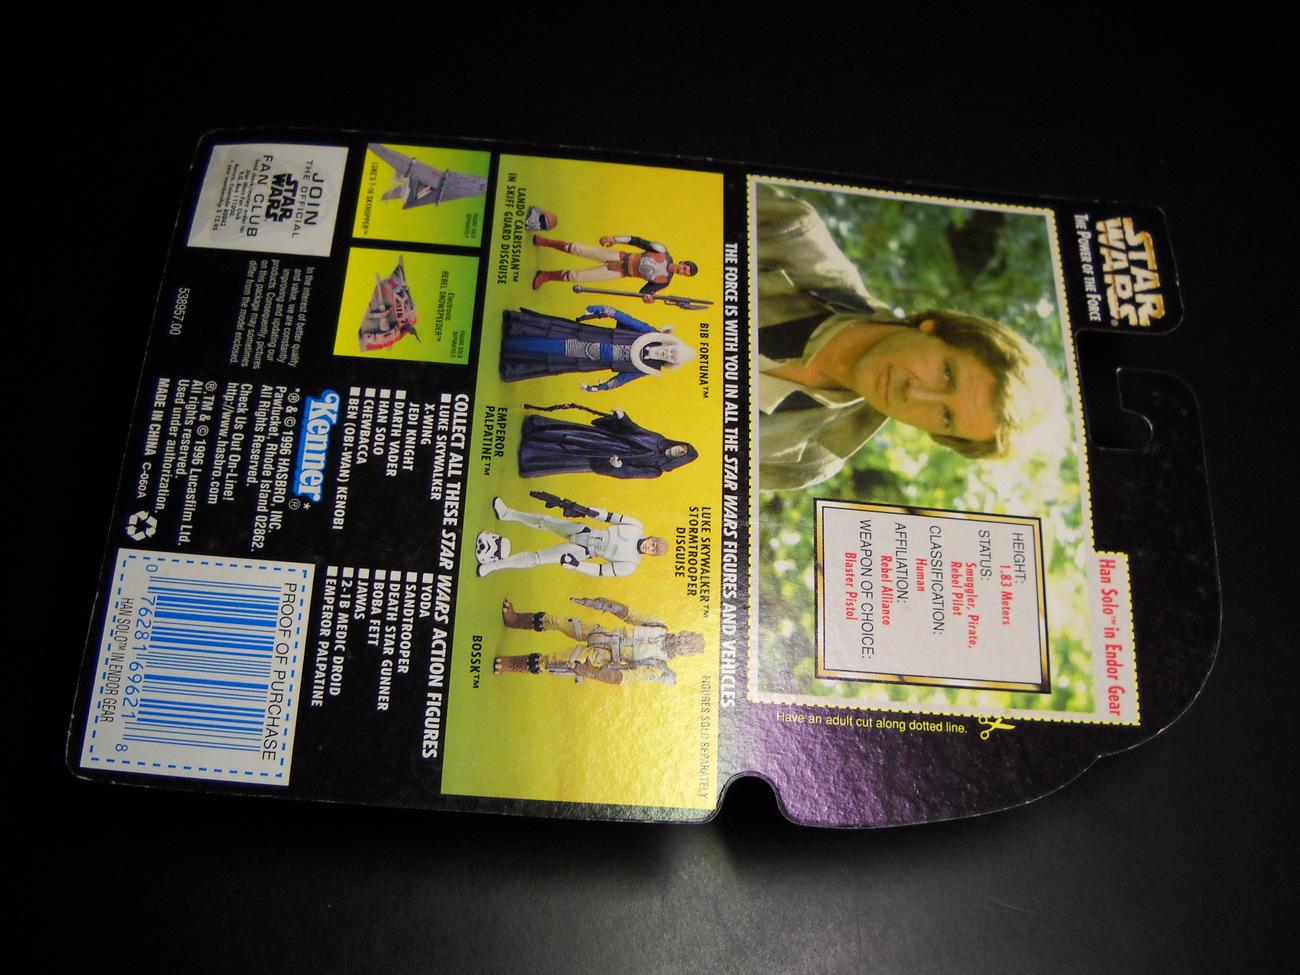 Star Wars POTF Hans Solo Endor Gear Action Figure Green Card Factory Sealed Card